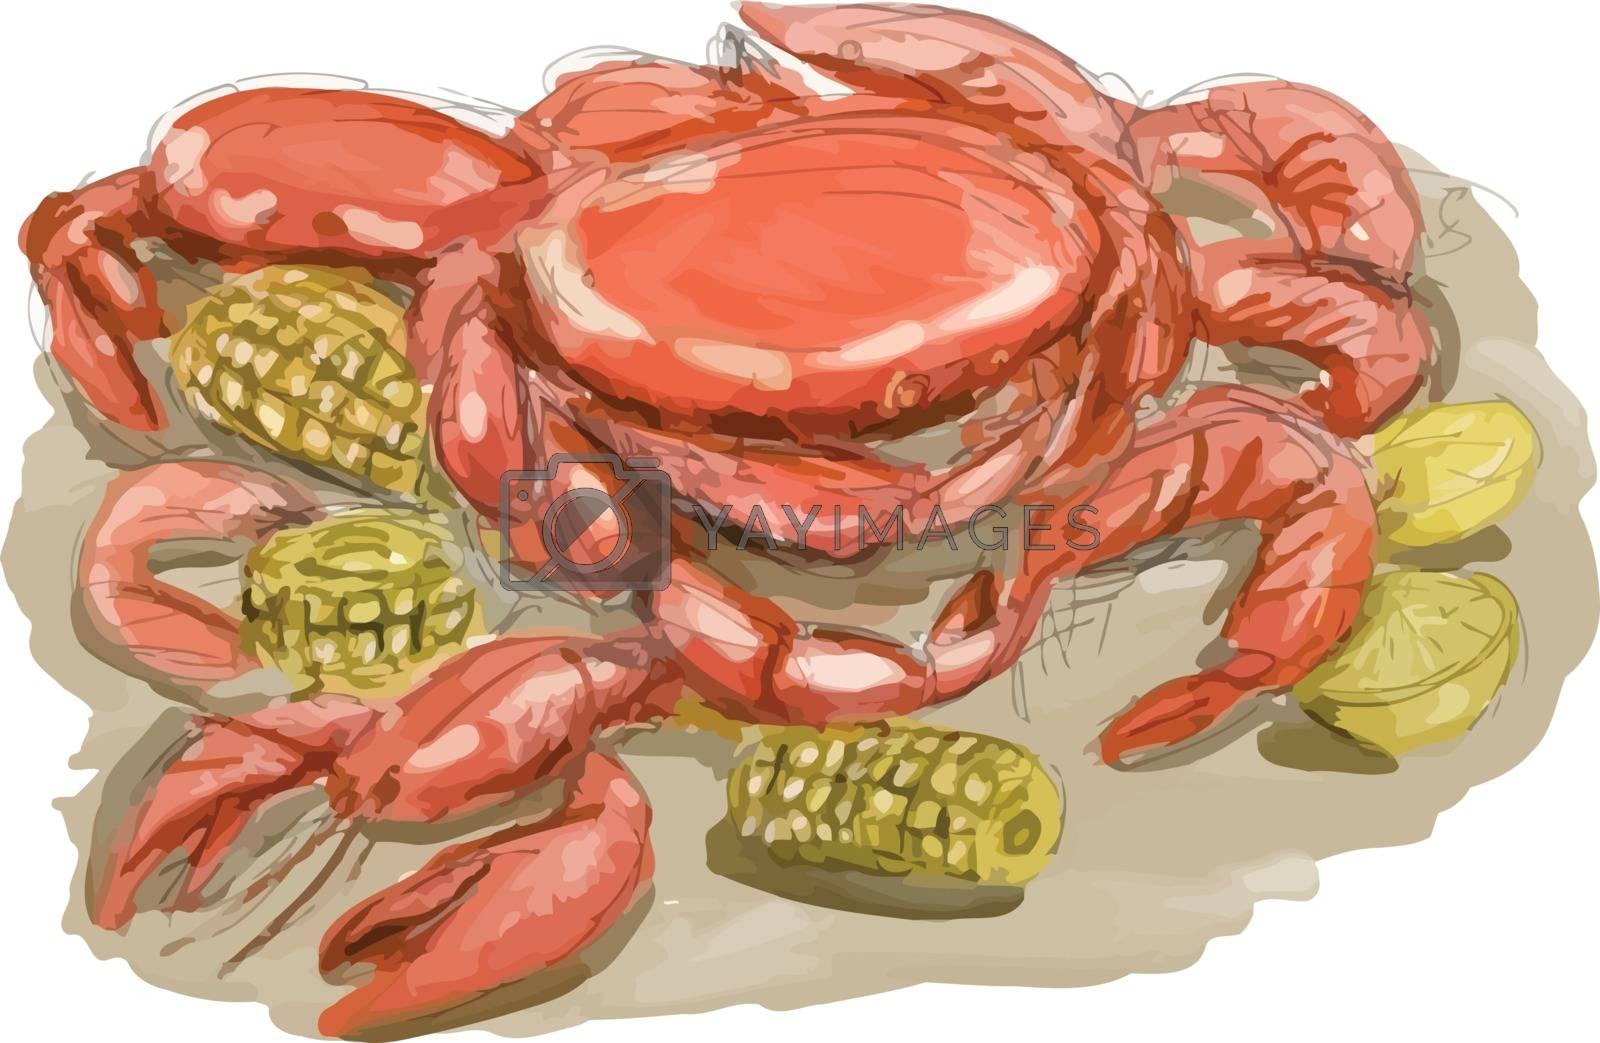 Royalty free image of Cajun Seafood Watercolor by patrimonio